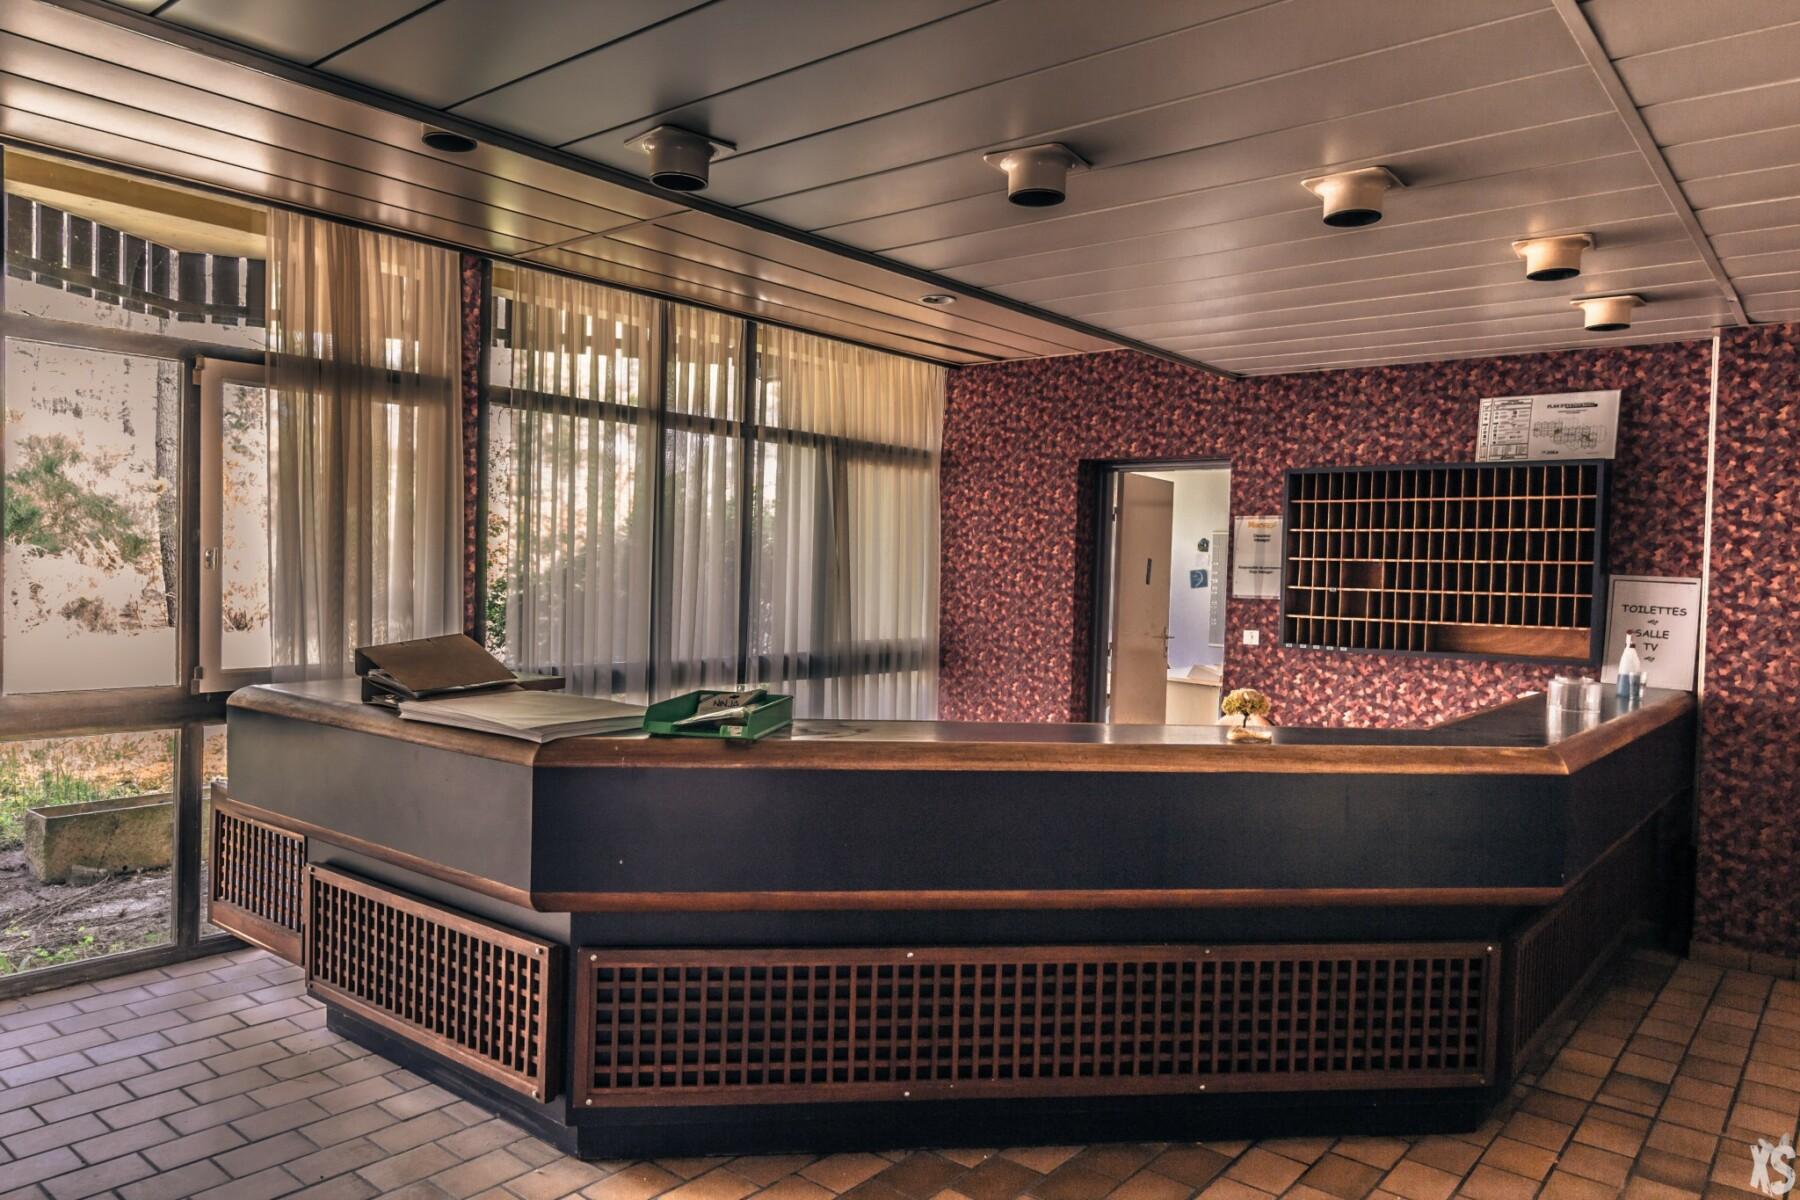 hotel-fryberg-31